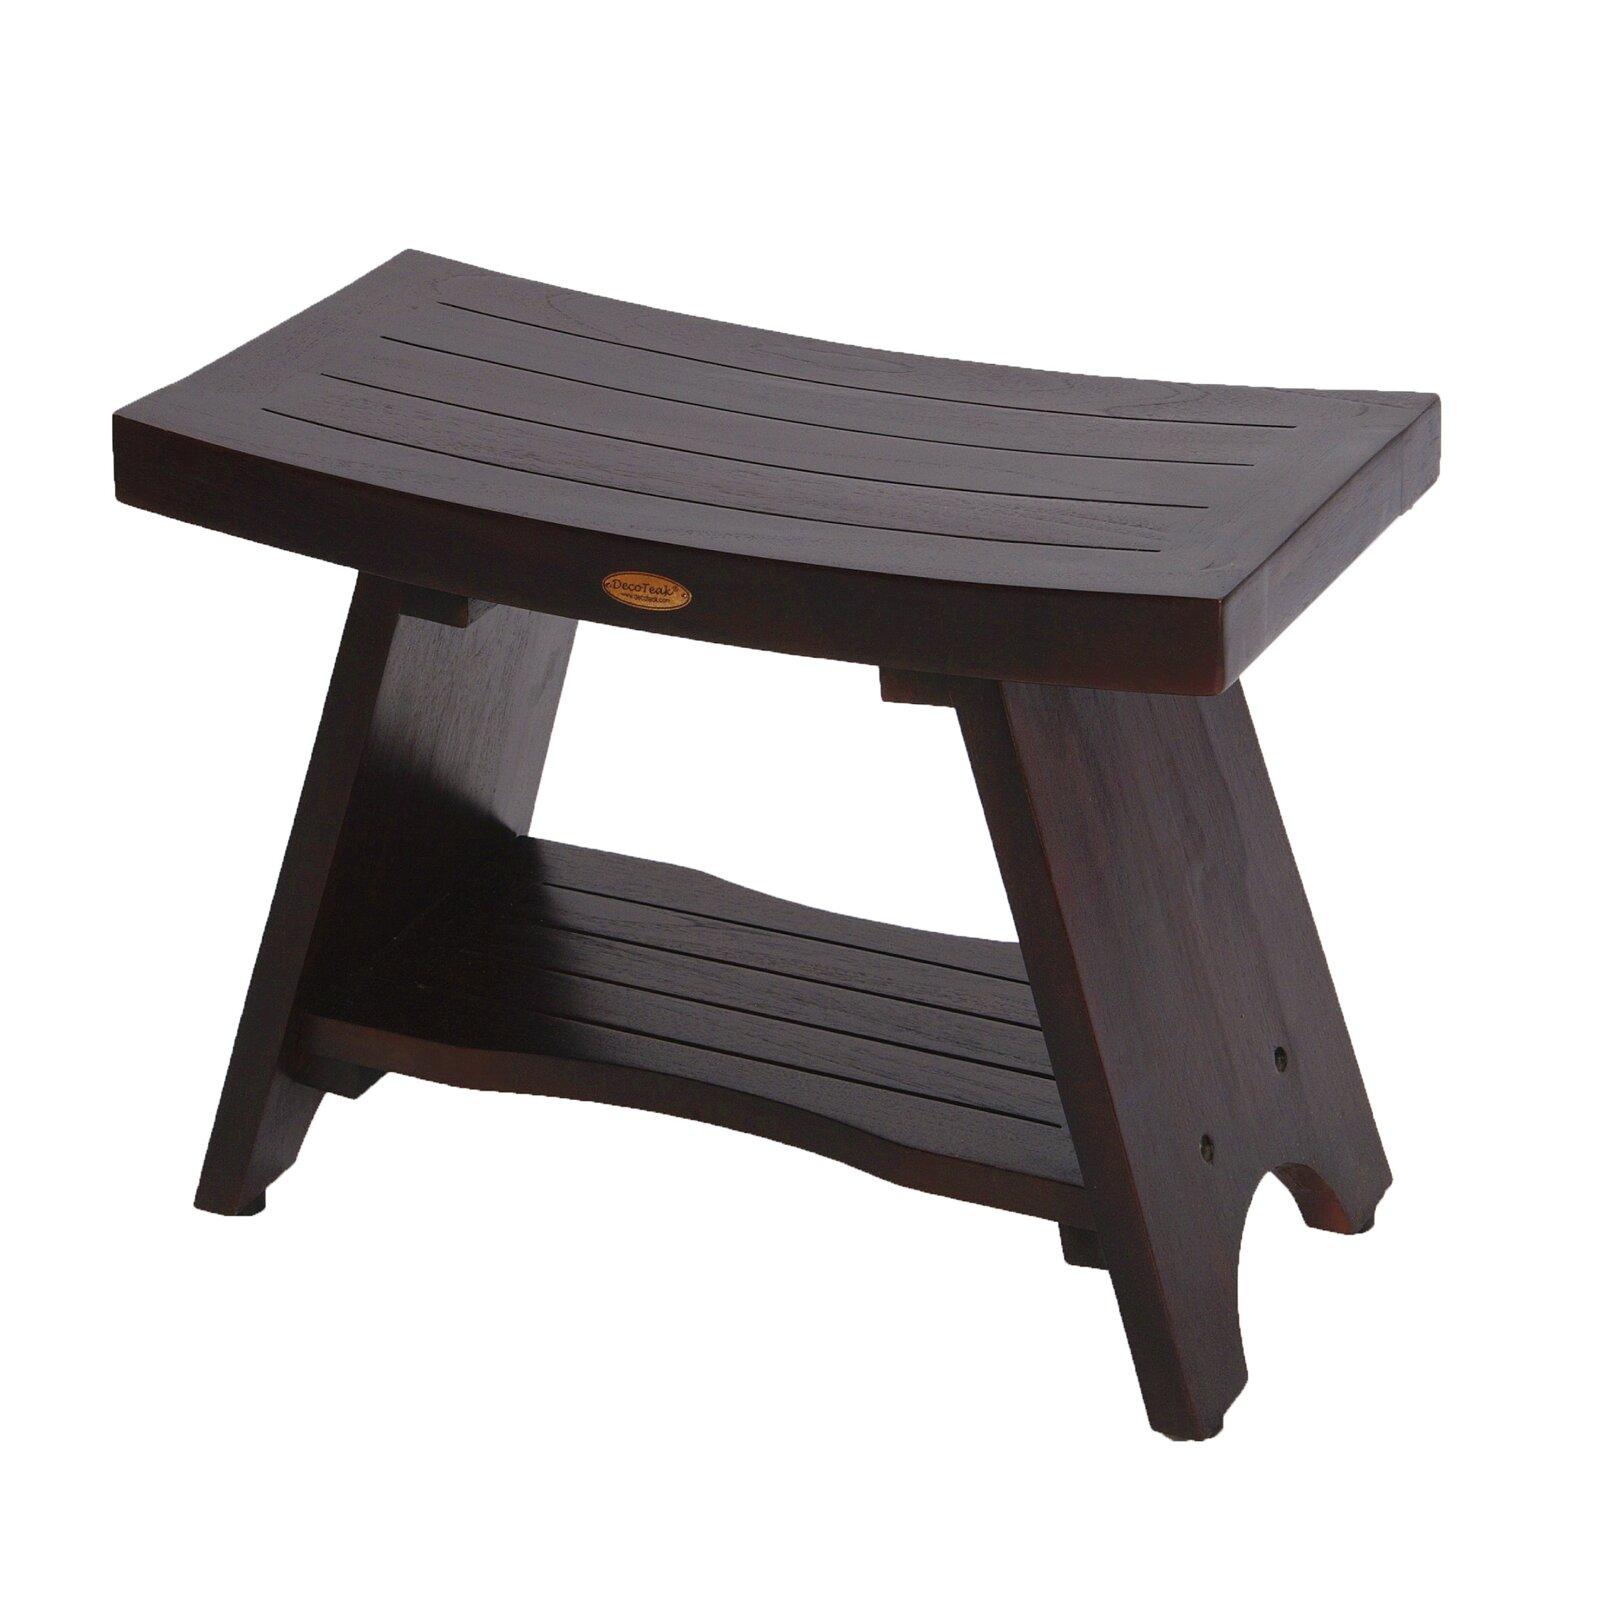 chairs shower dreamline teak x stool folding wood stools tk p chrome shst in seat natural